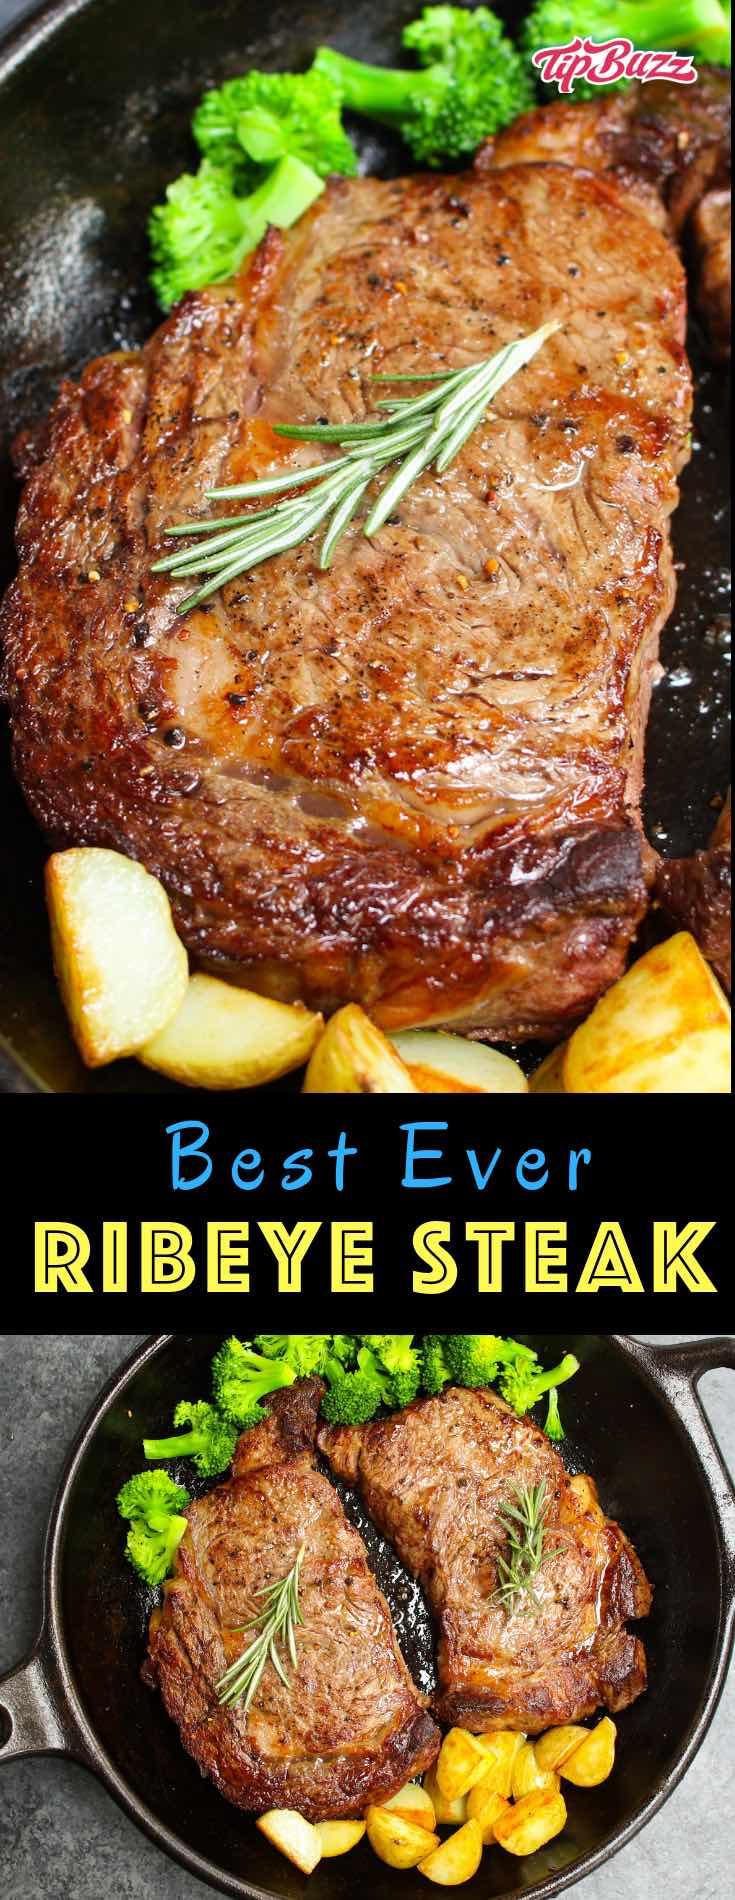 Pan Seared Rib Eye Steak Recipe - TipBuzz